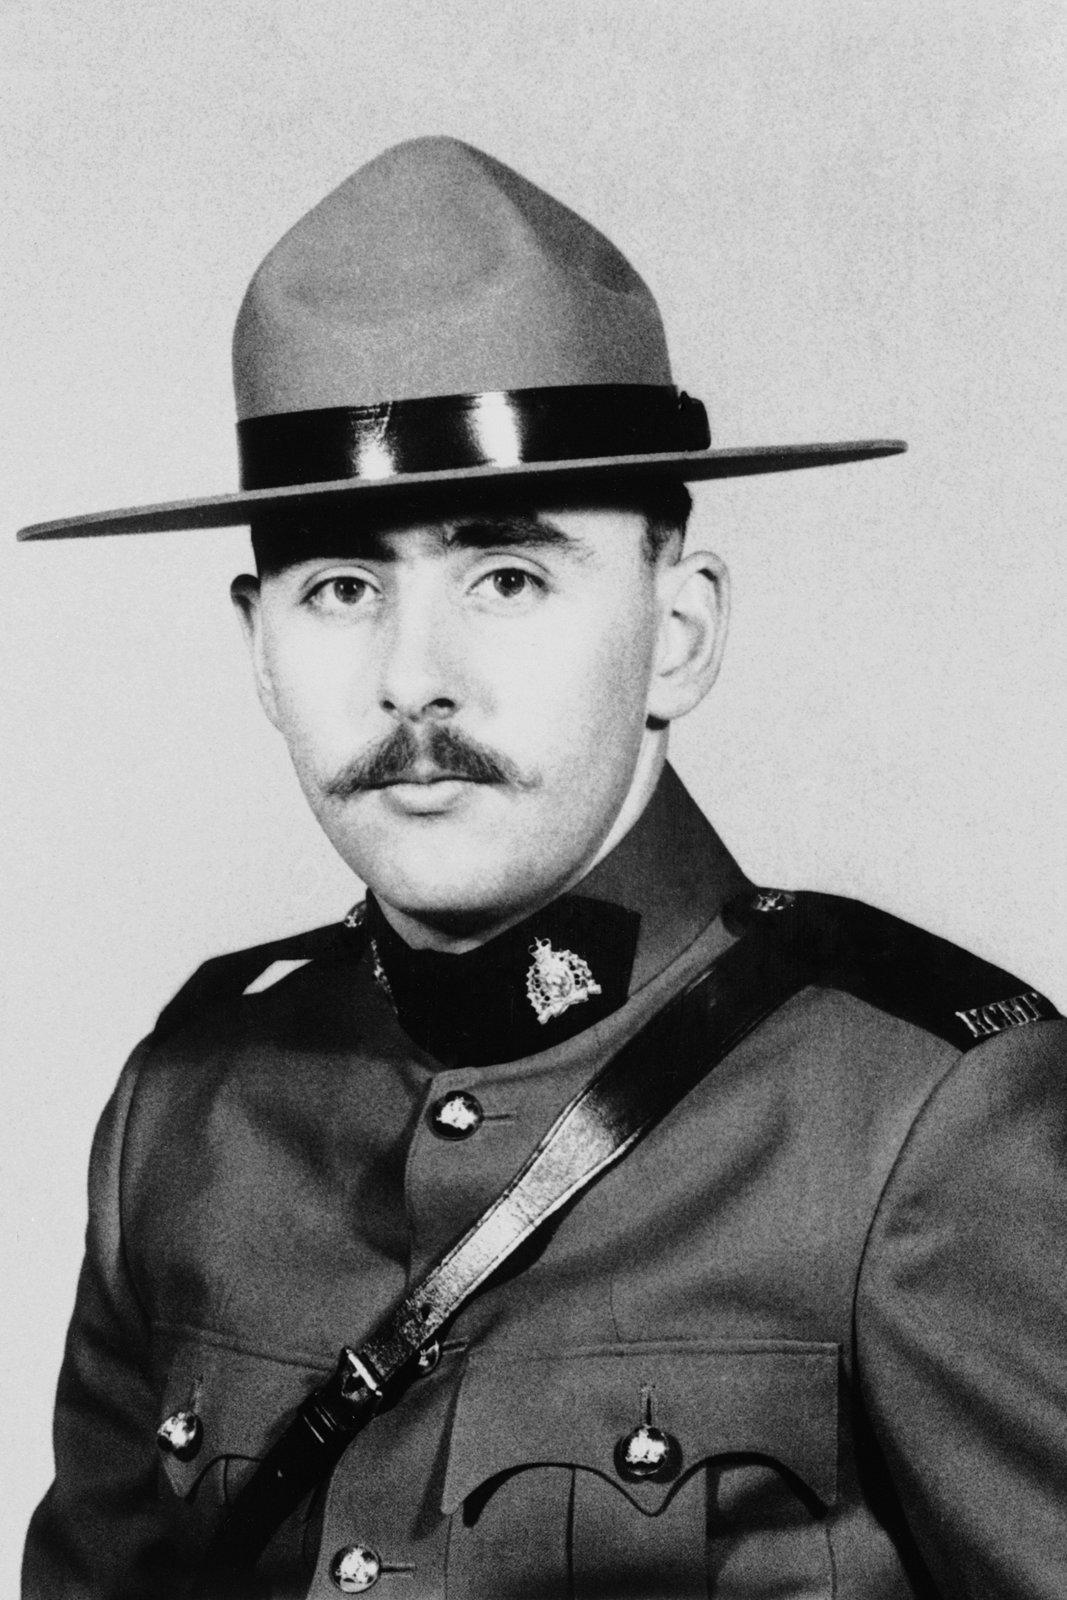 Gendarme Roger Emile Pierlet